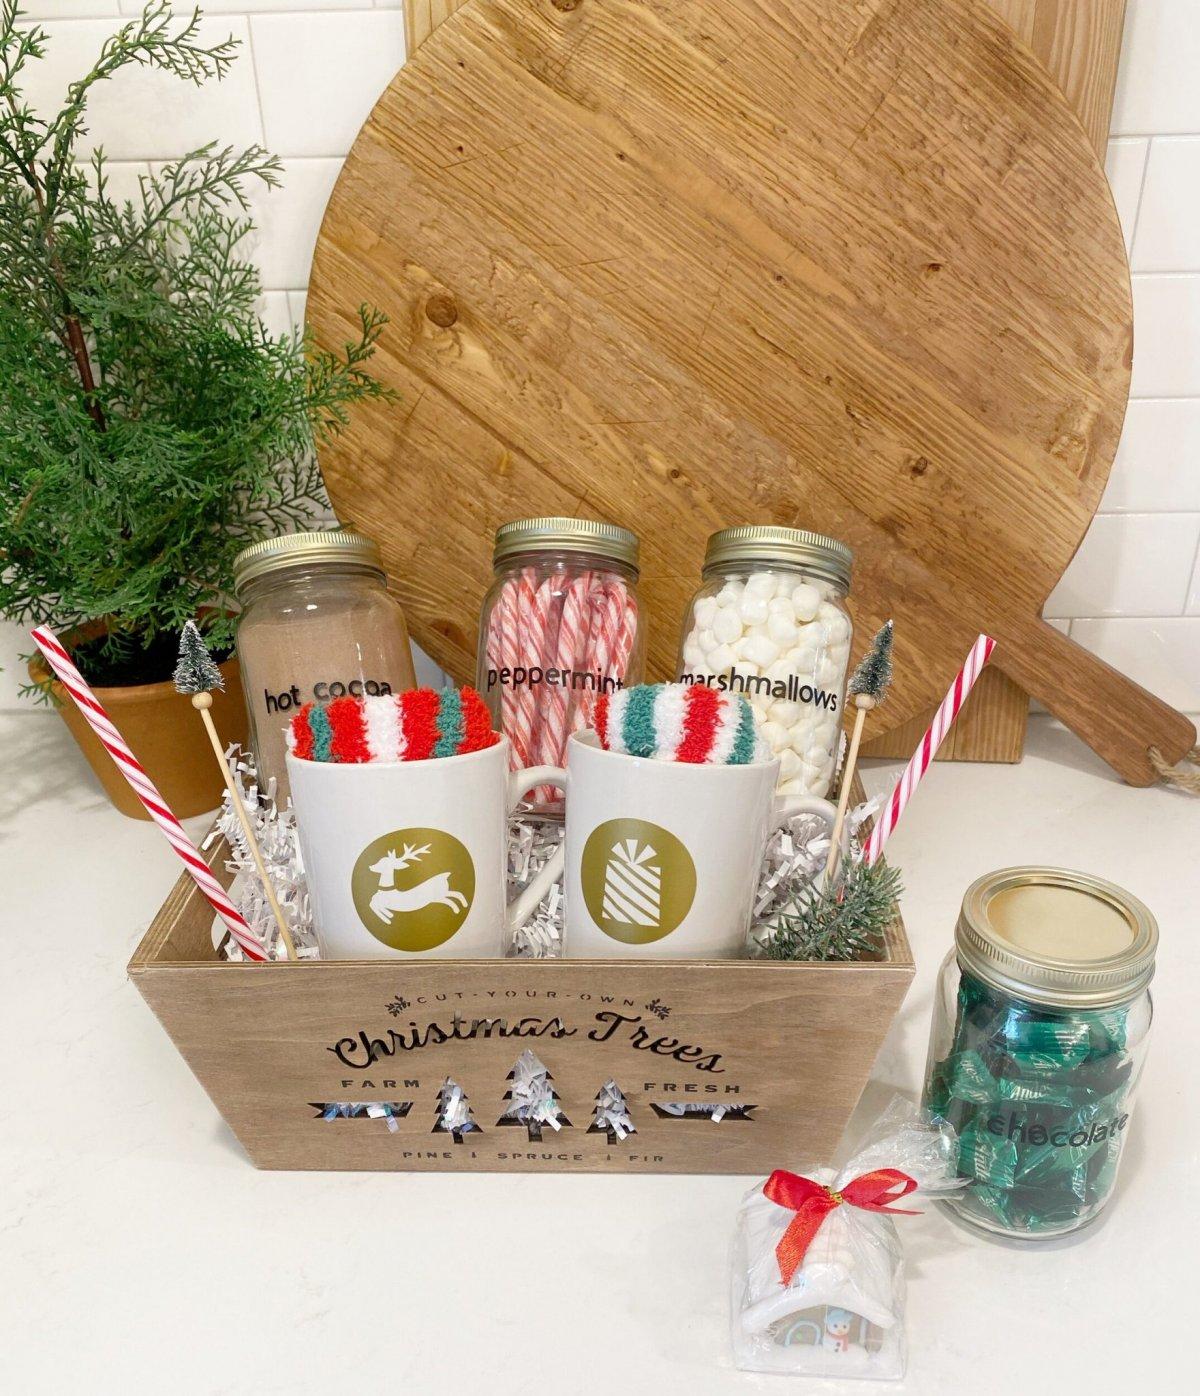 25 Homemade Christmas Gift Ideas Made With Cricut